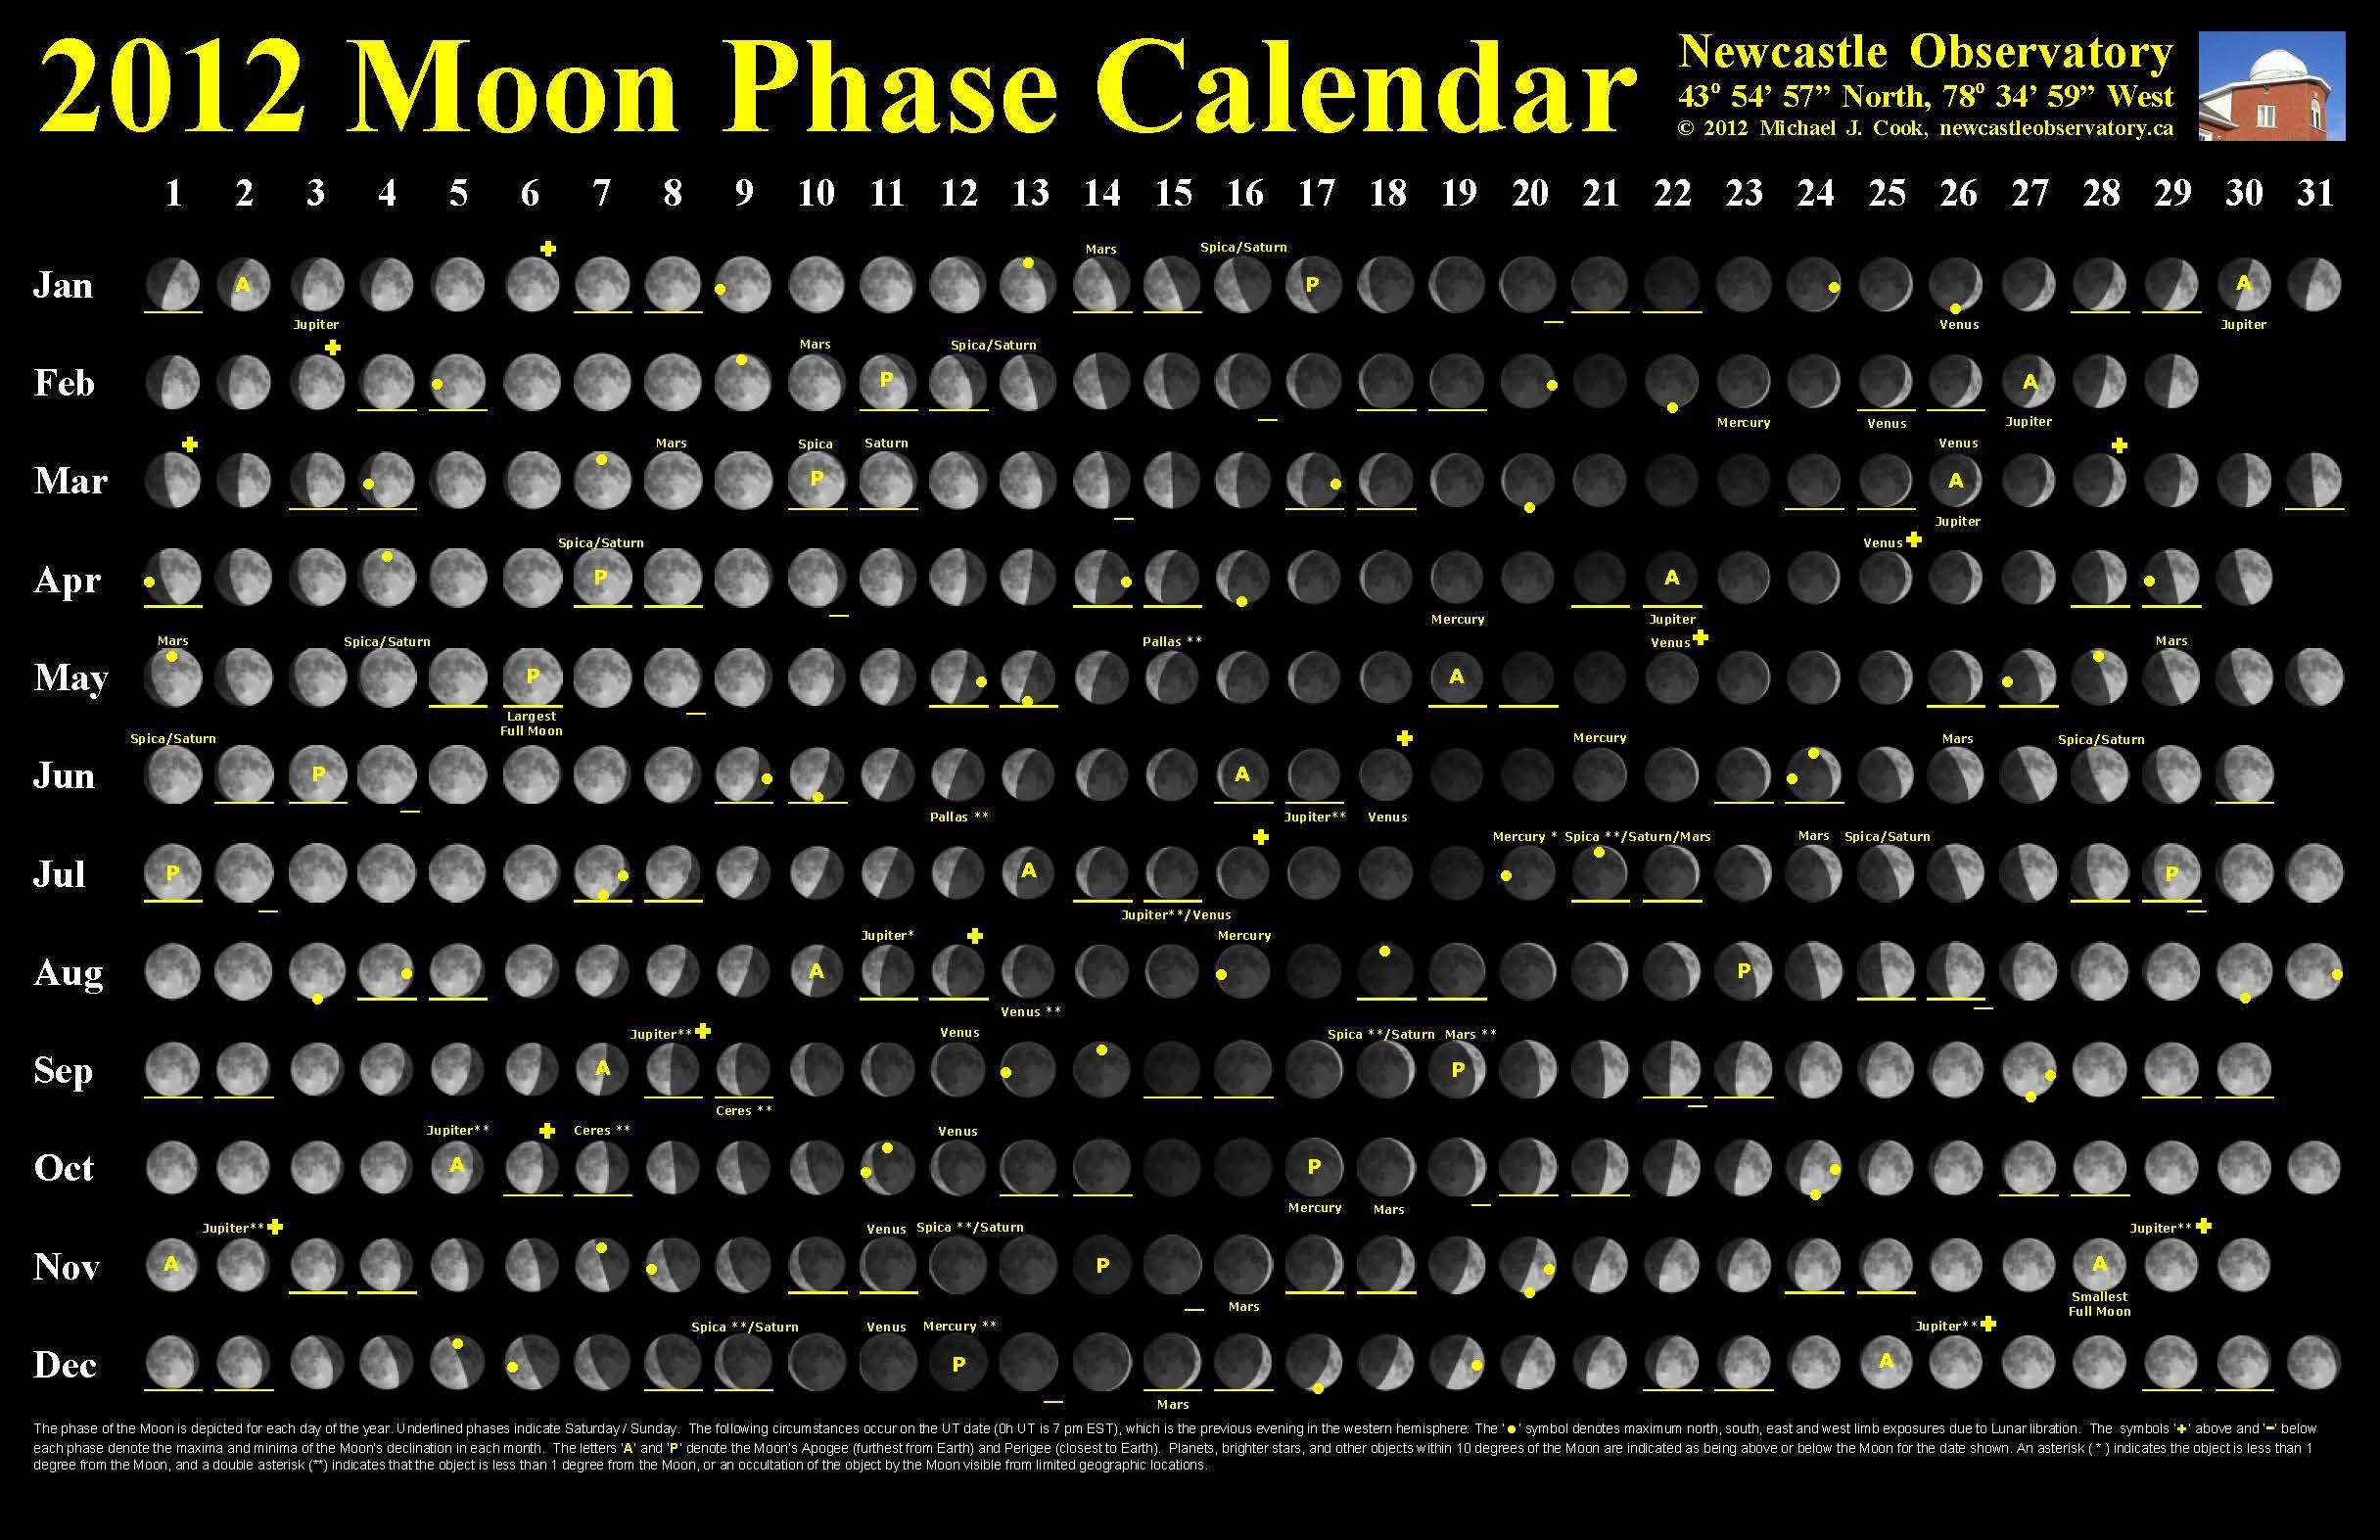 Calendar News Tonight Lunar Moon Phases 2018 Lunar Calendar Time And Date 2012 Moon Phase Calendar Update Newcastle Observatory